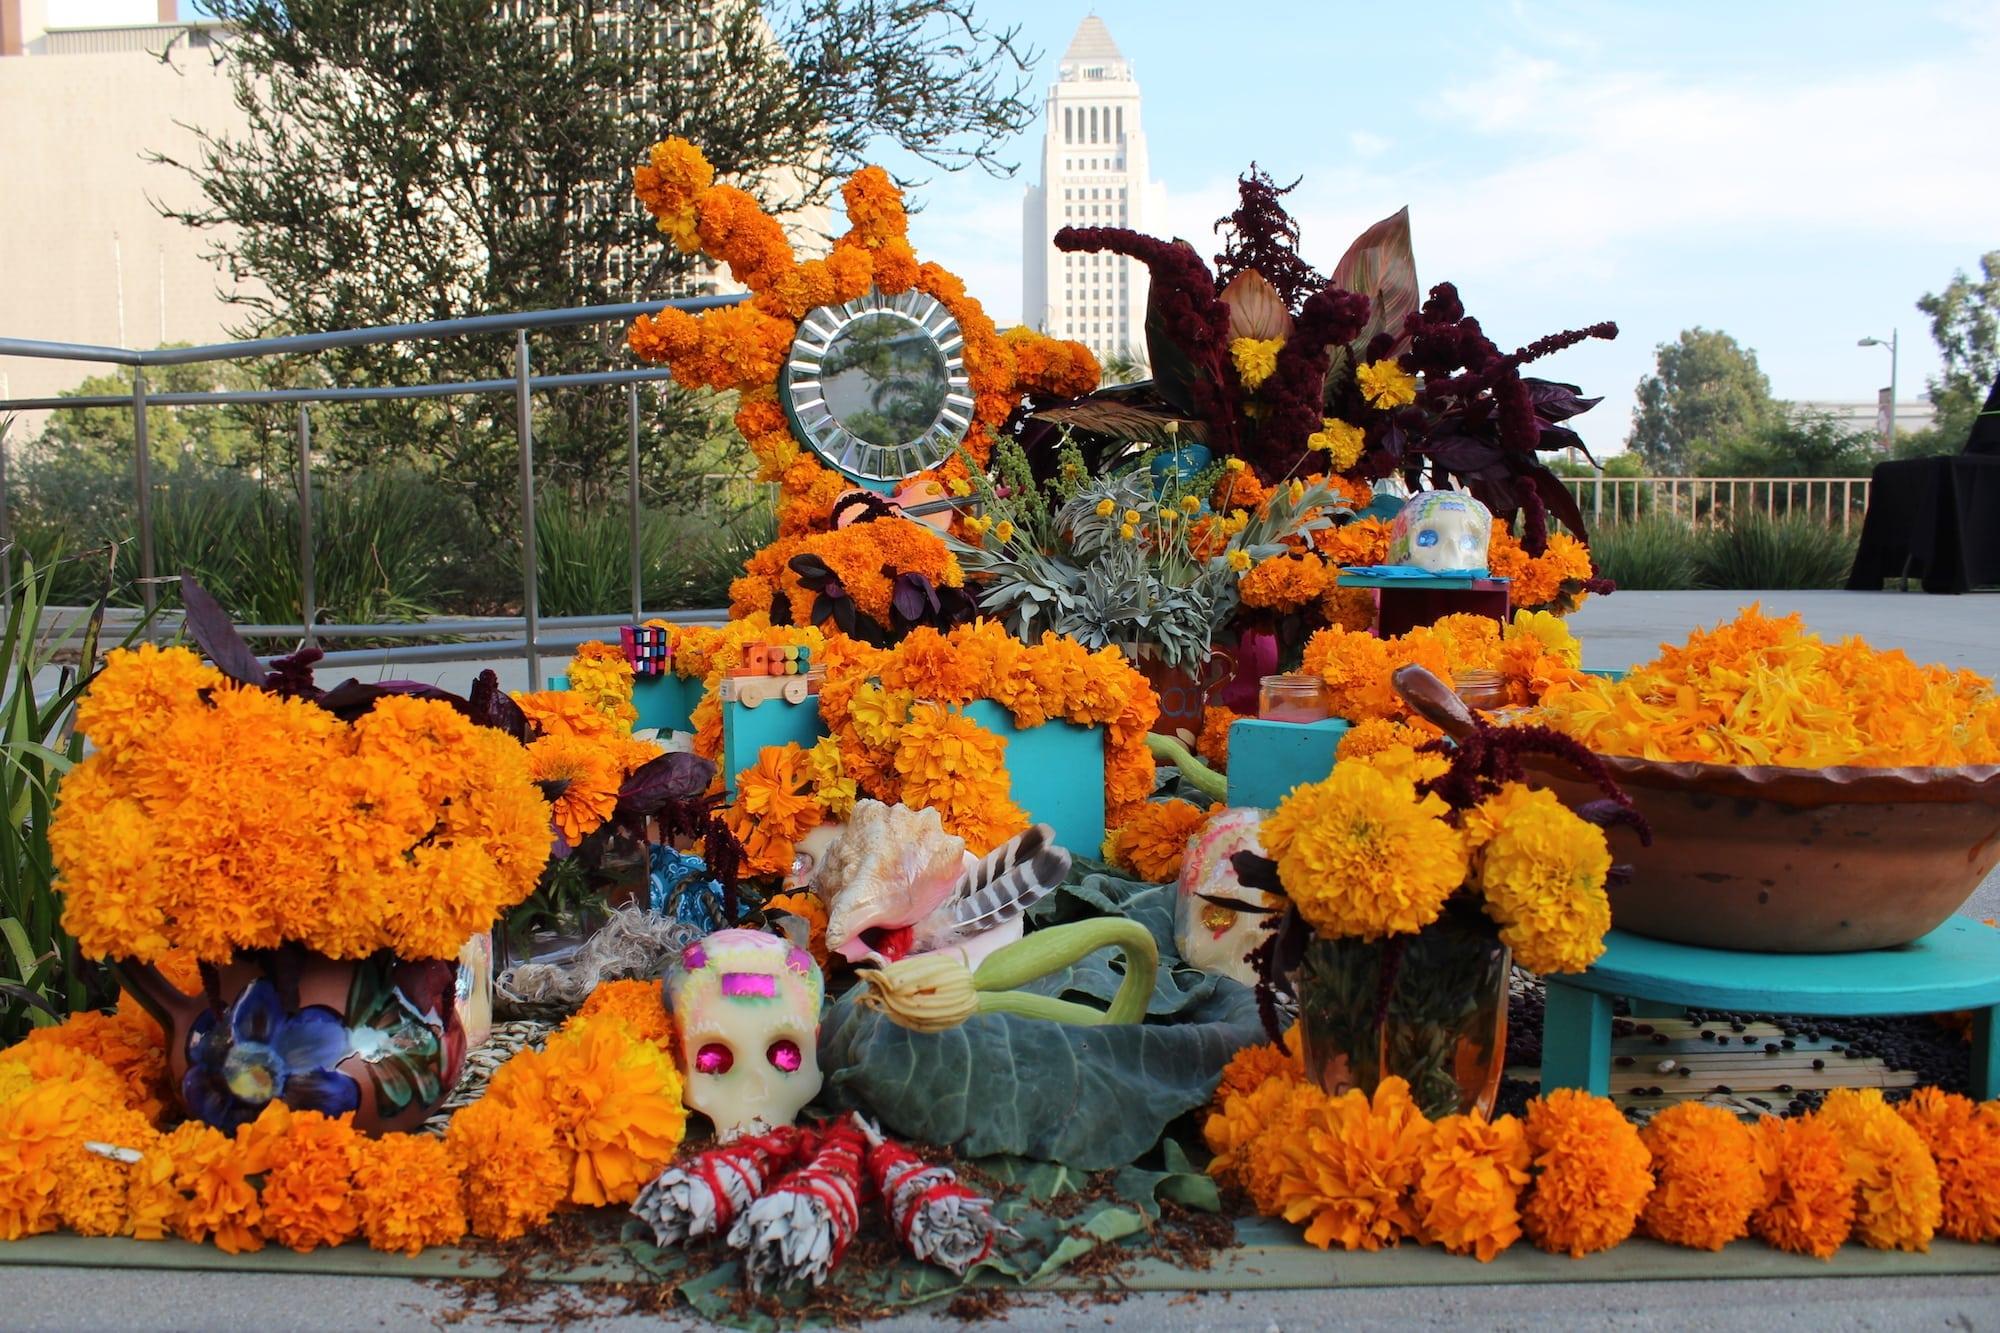 Grand Park's Dia de los Muertos Celebration